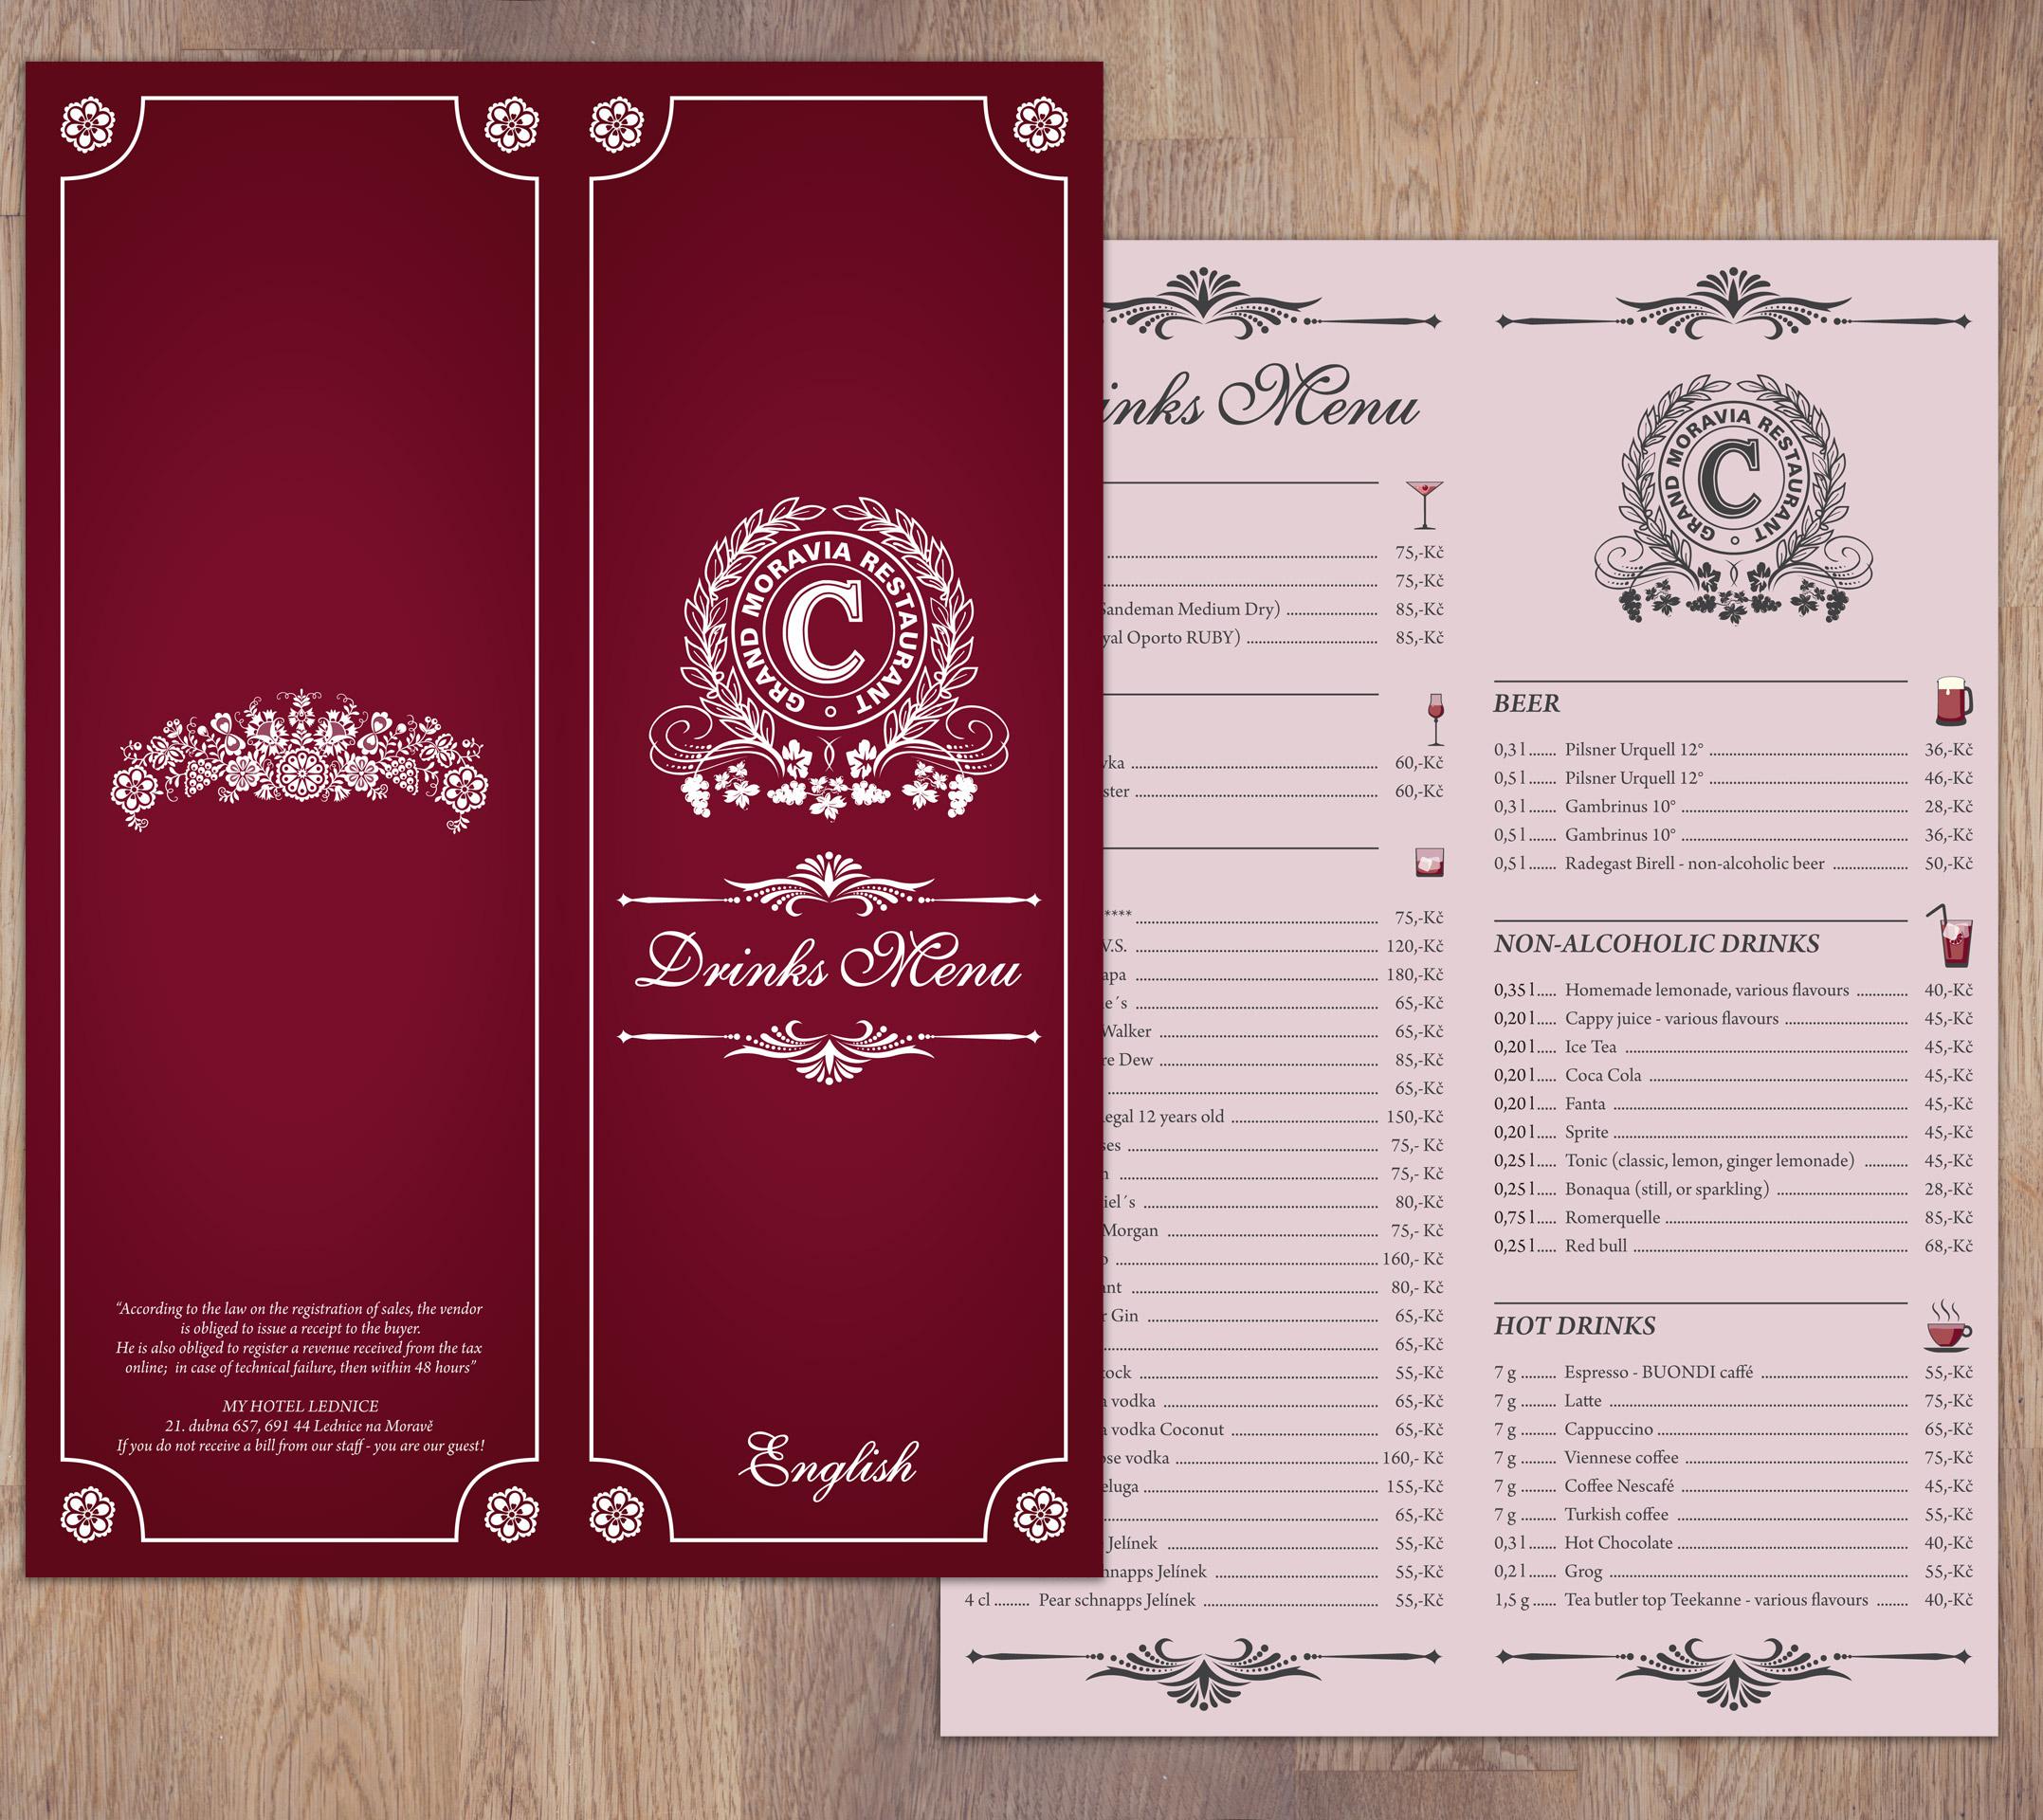 Drinks menu design for My Hotel